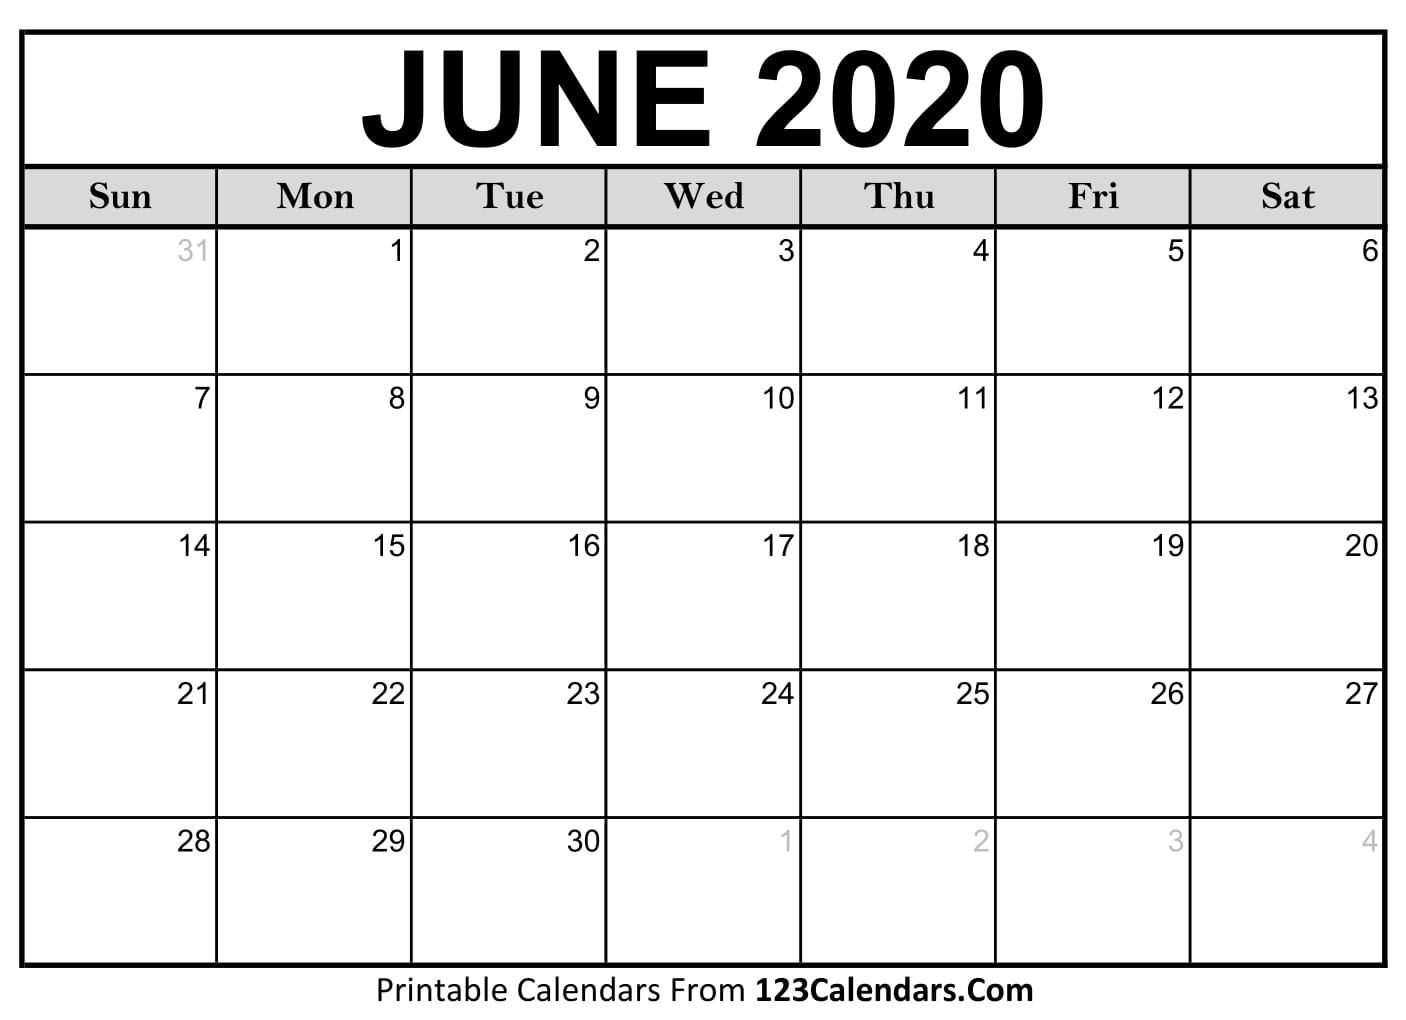 June 2020 Printable Calendar | 123Calendars-Blank Printable Calendar 2020 June